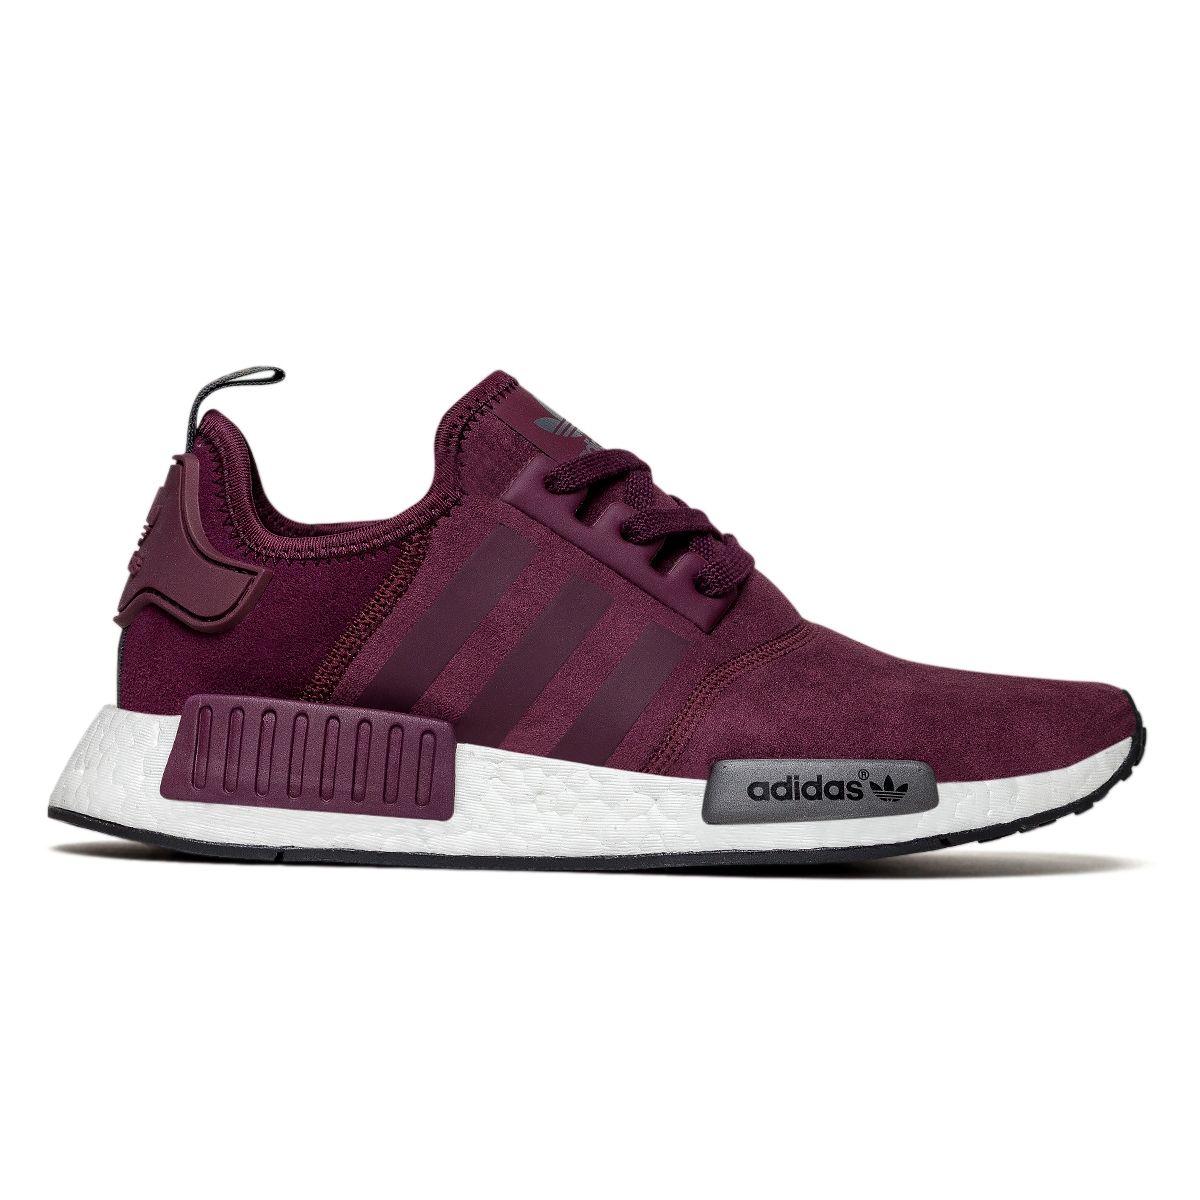 separation shoes 5e693 f7907 Adidas NMD Runner Feminino Burgundy - Maze